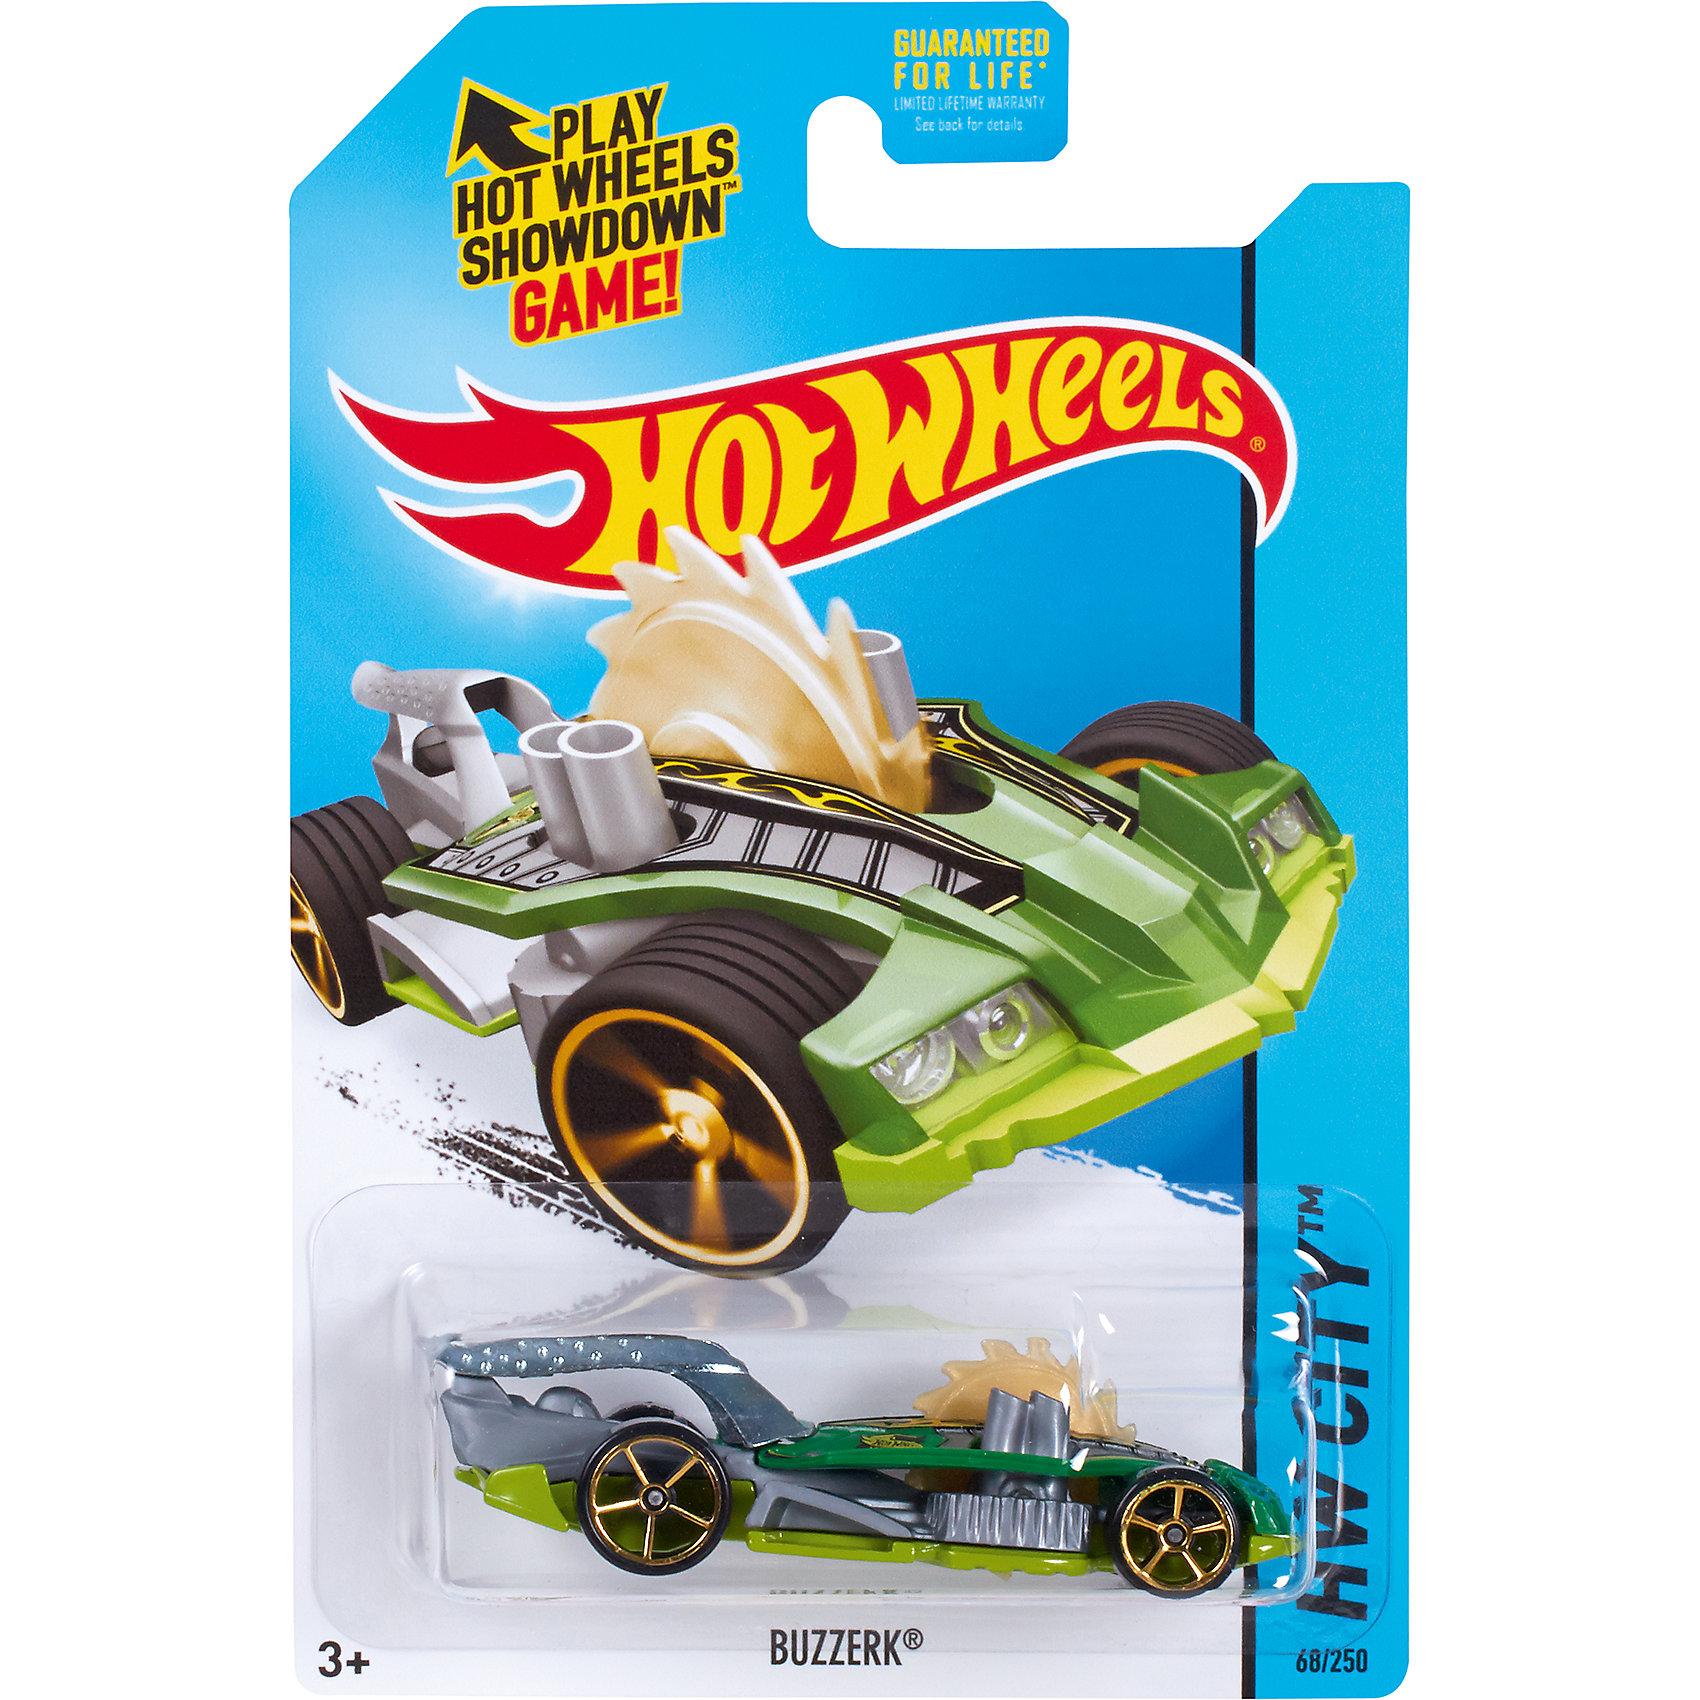 Базовая машинка Hot Wheels, BuzzerkМашинки<br><br><br>Ширина мм: 110<br>Глубина мм: 45<br>Высота мм: 110<br>Вес г: 30<br>Возраст от месяцев: 36<br>Возраст до месяцев: 96<br>Пол: Мужской<br>Возраст: Детский<br>SKU: 7111917